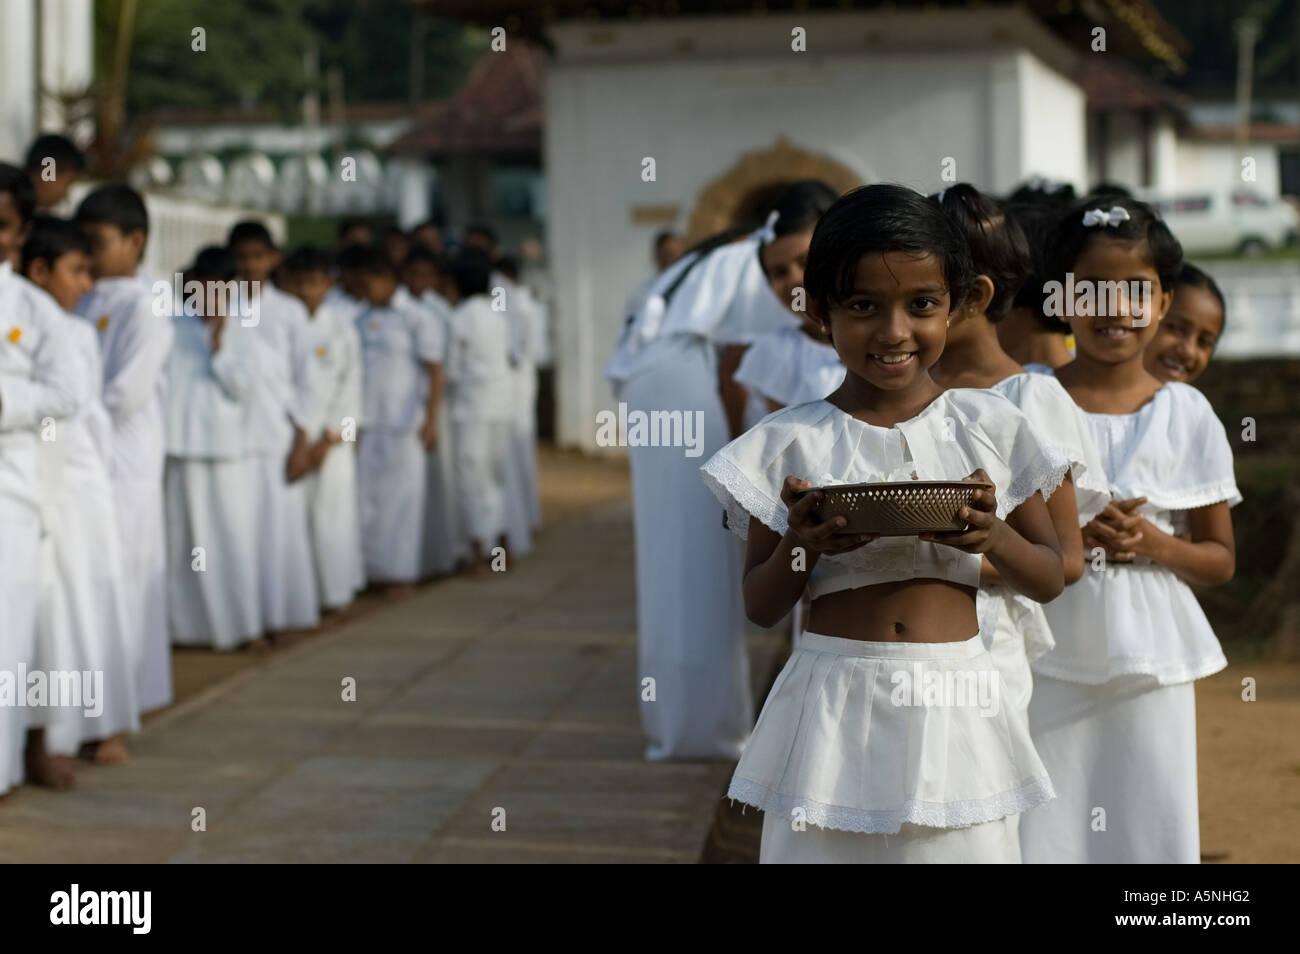 School Girls Kandy Sri Lanka Stock Photos & School Girls Kandy Sri